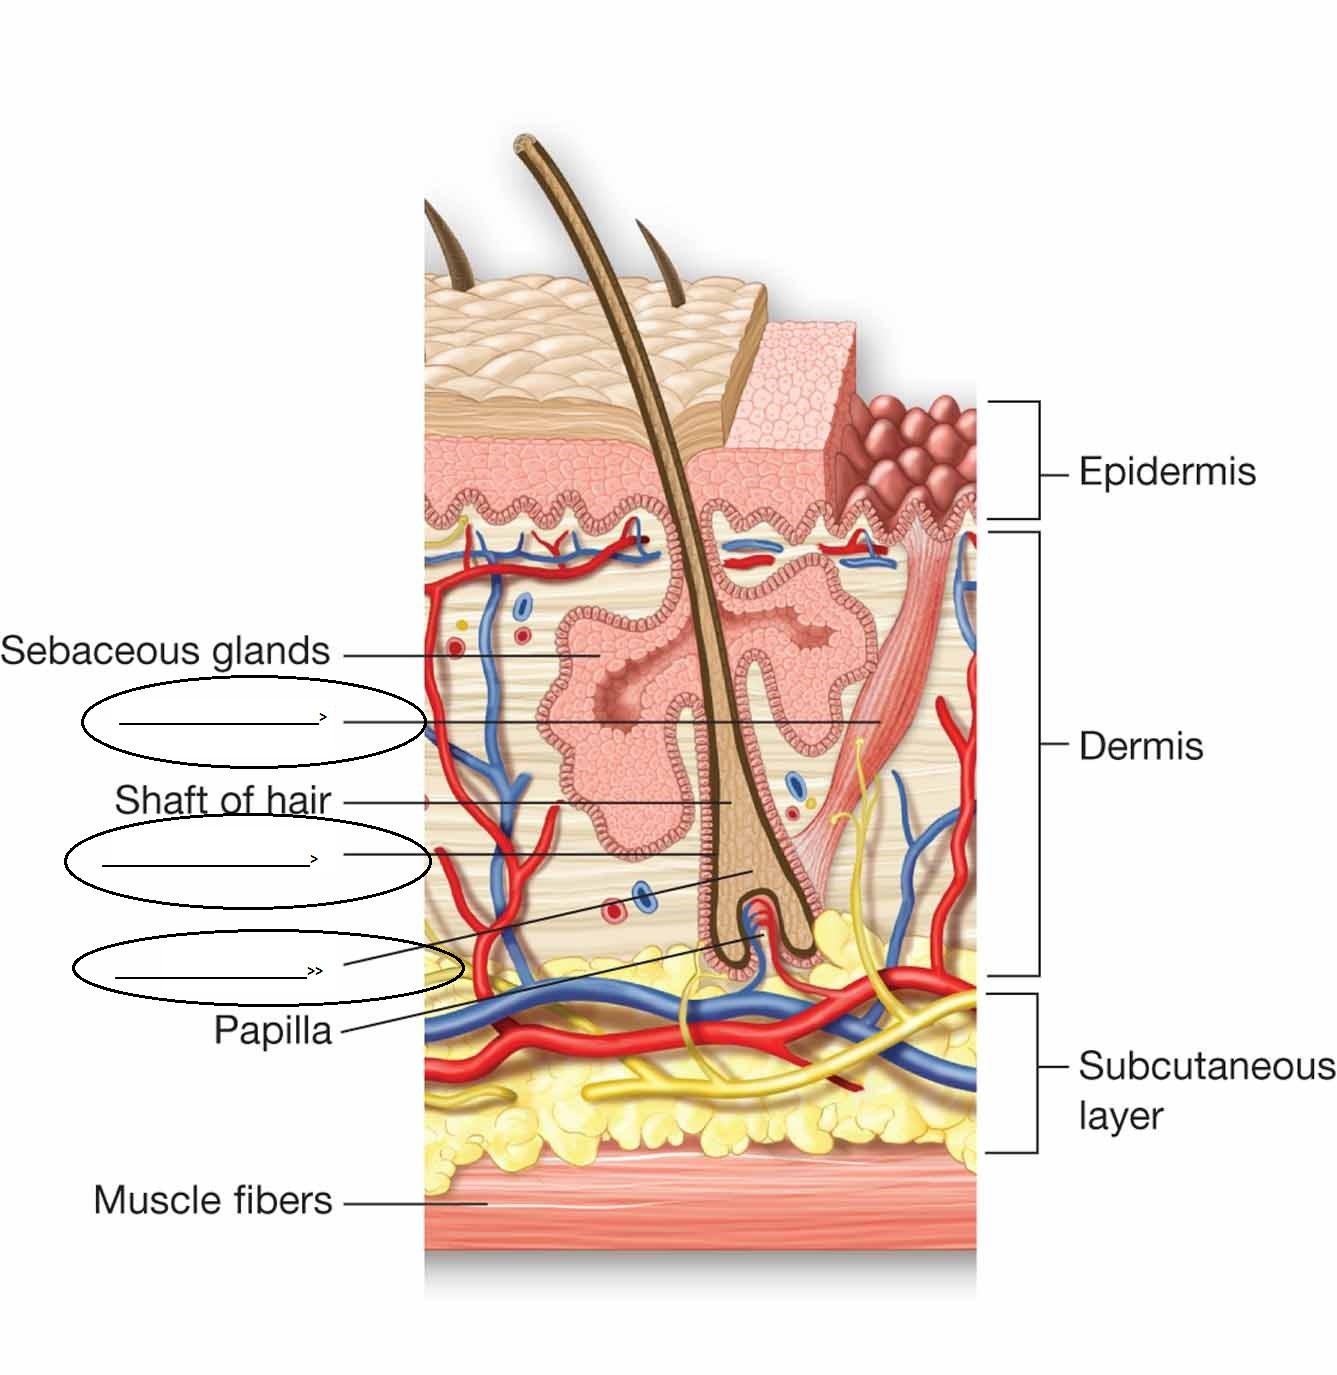 sannu s story anatomy and physiology Книга doom стреляй и иди в формате txt книга doom код для вставки.